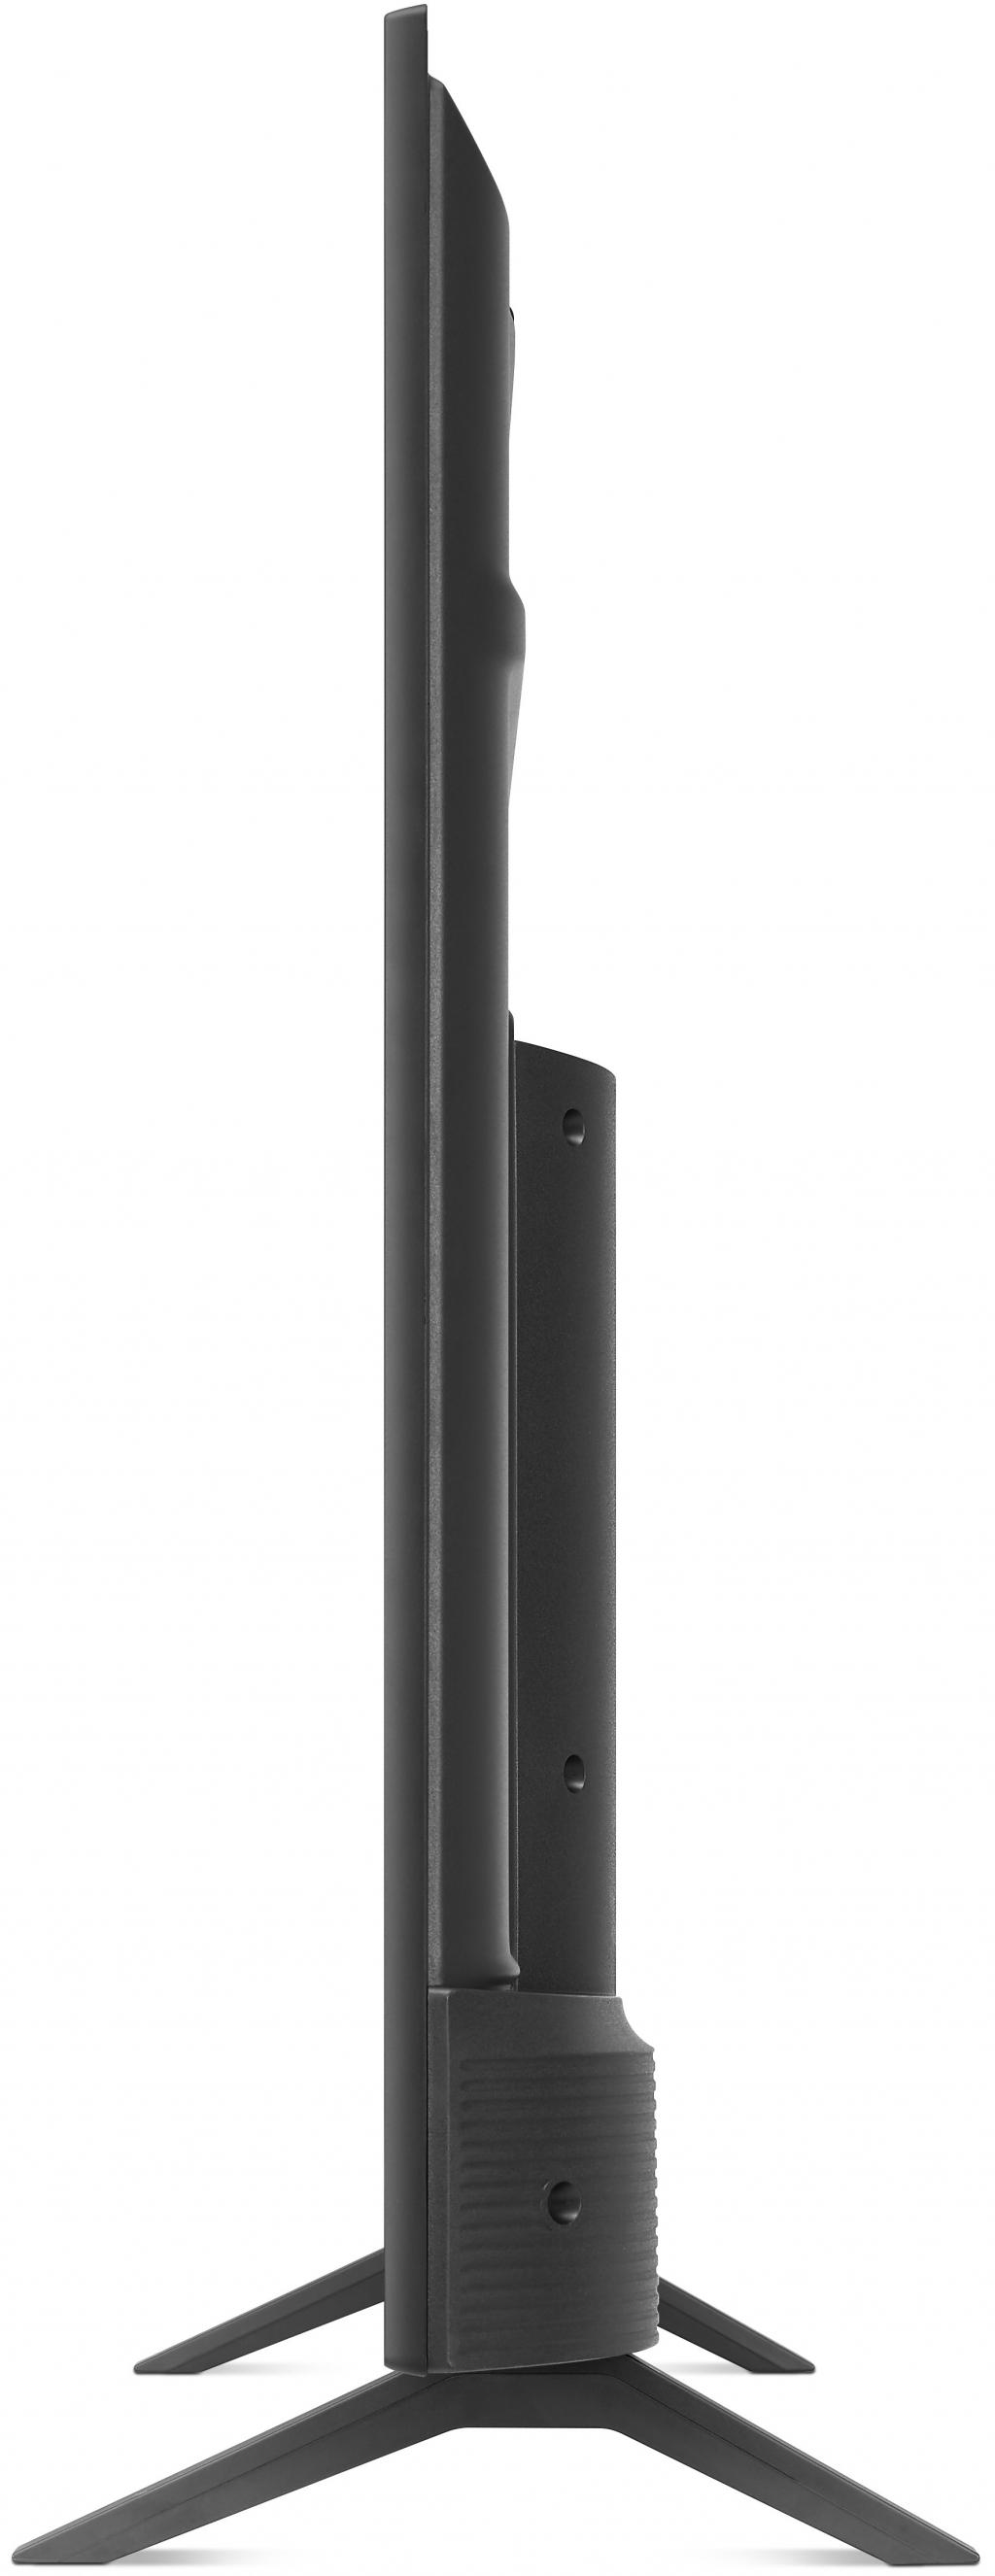 Телевизор LG LED 55UN70003LA